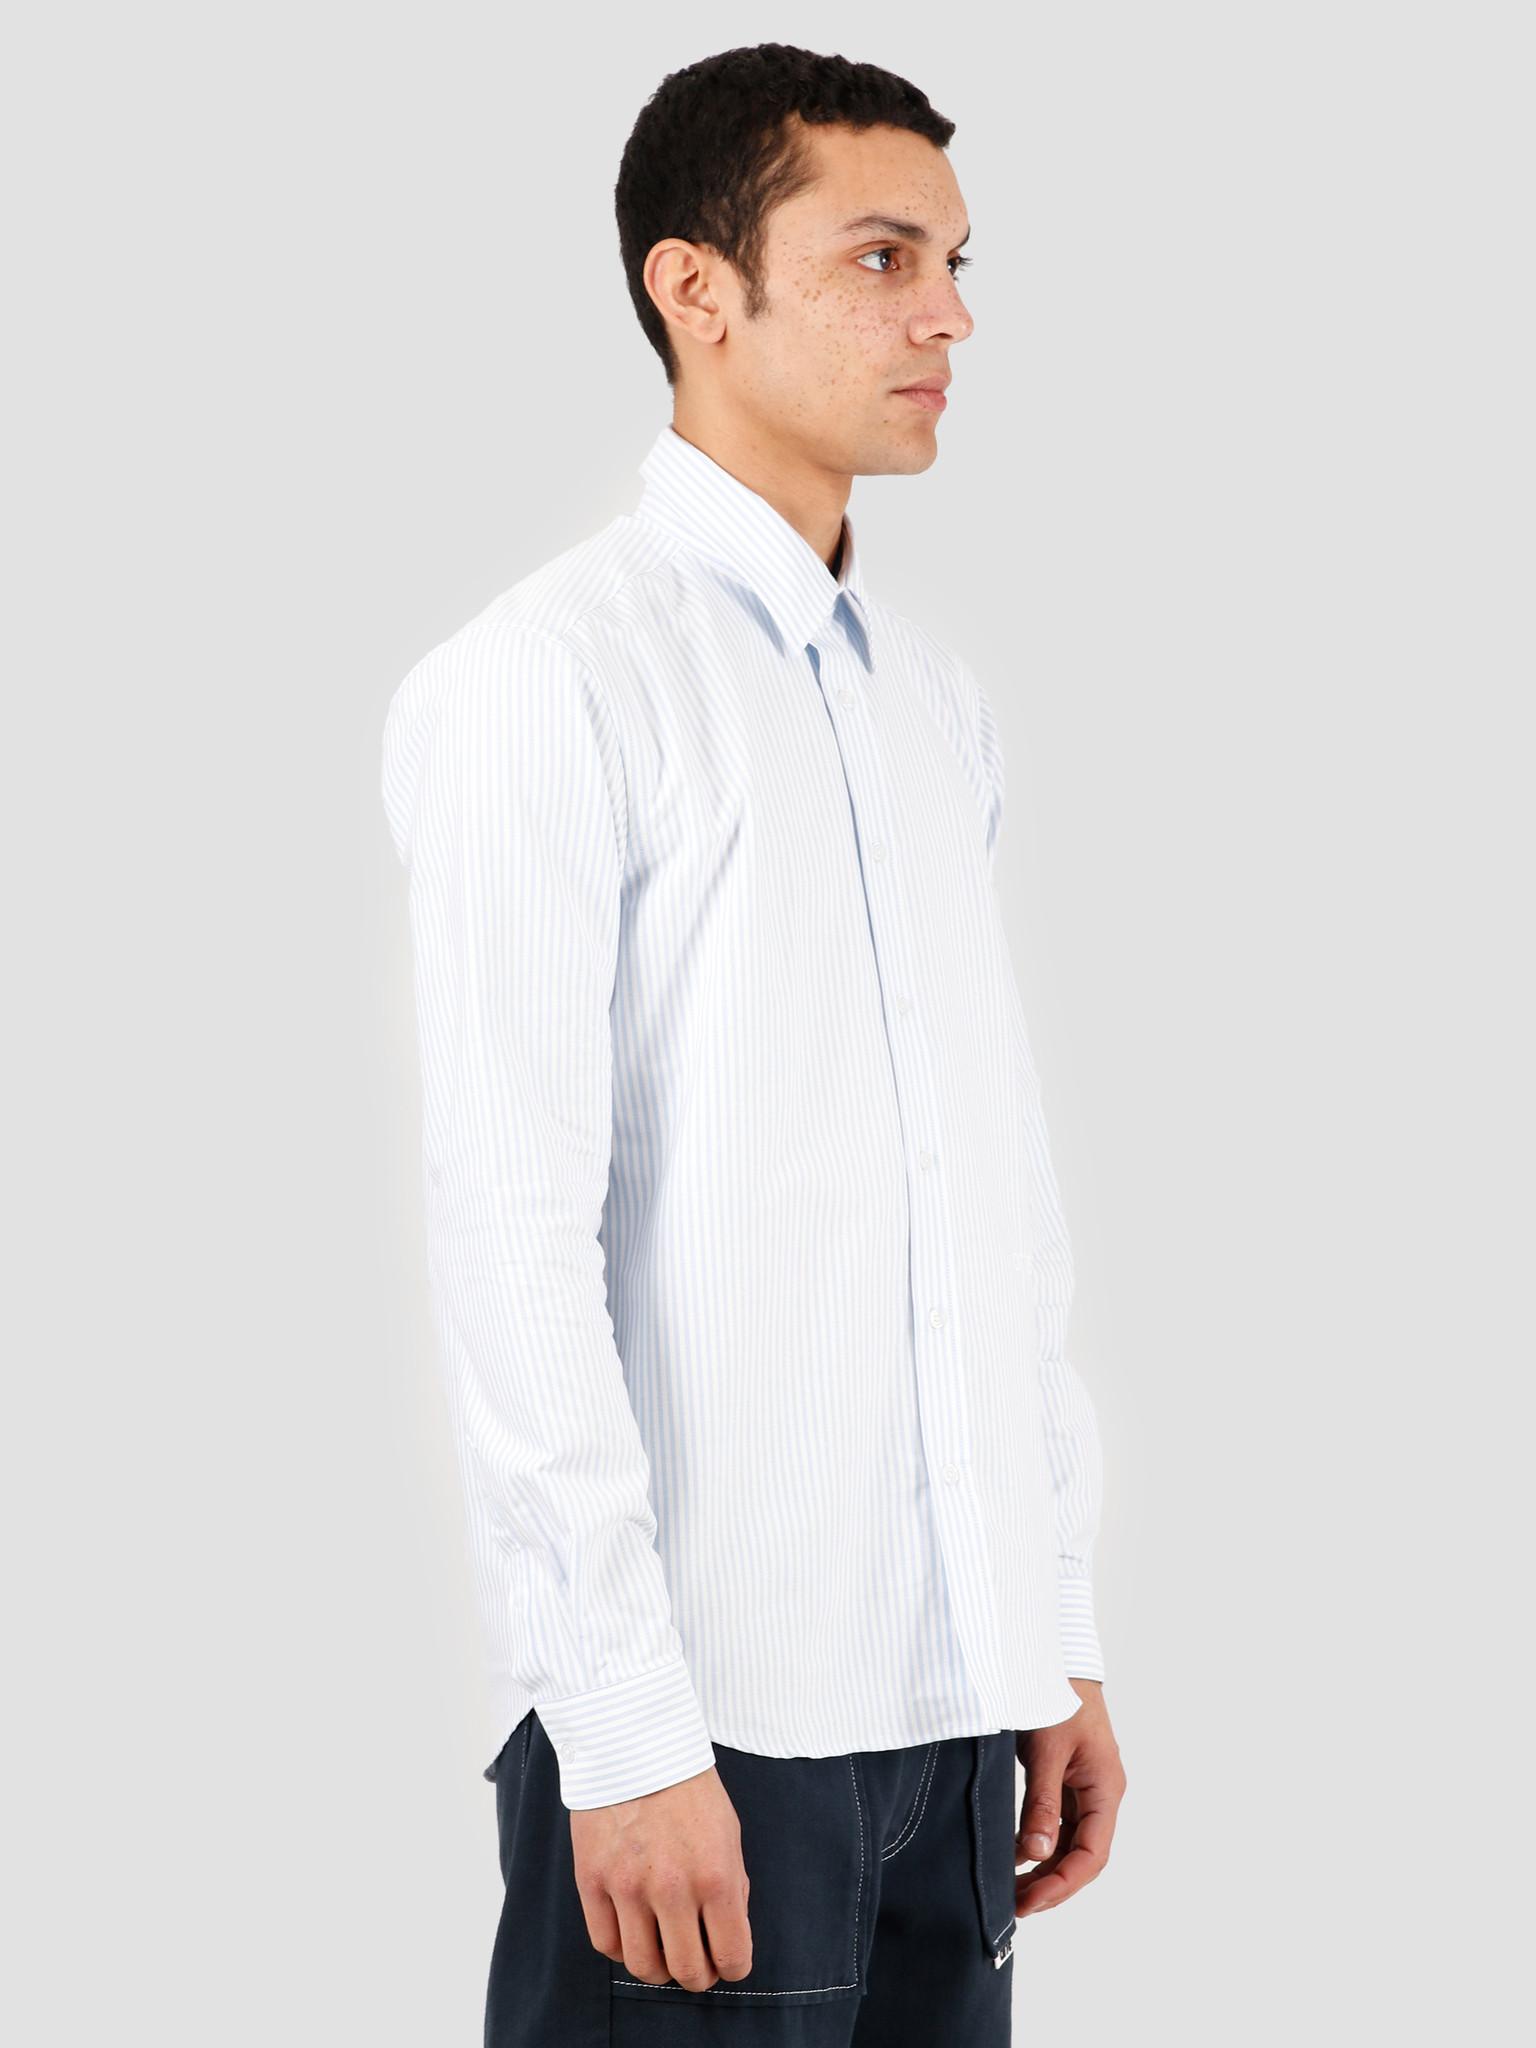 Arte Antwerp Arte Antwerp Stockton Shirt White Light Blue SS20-022S